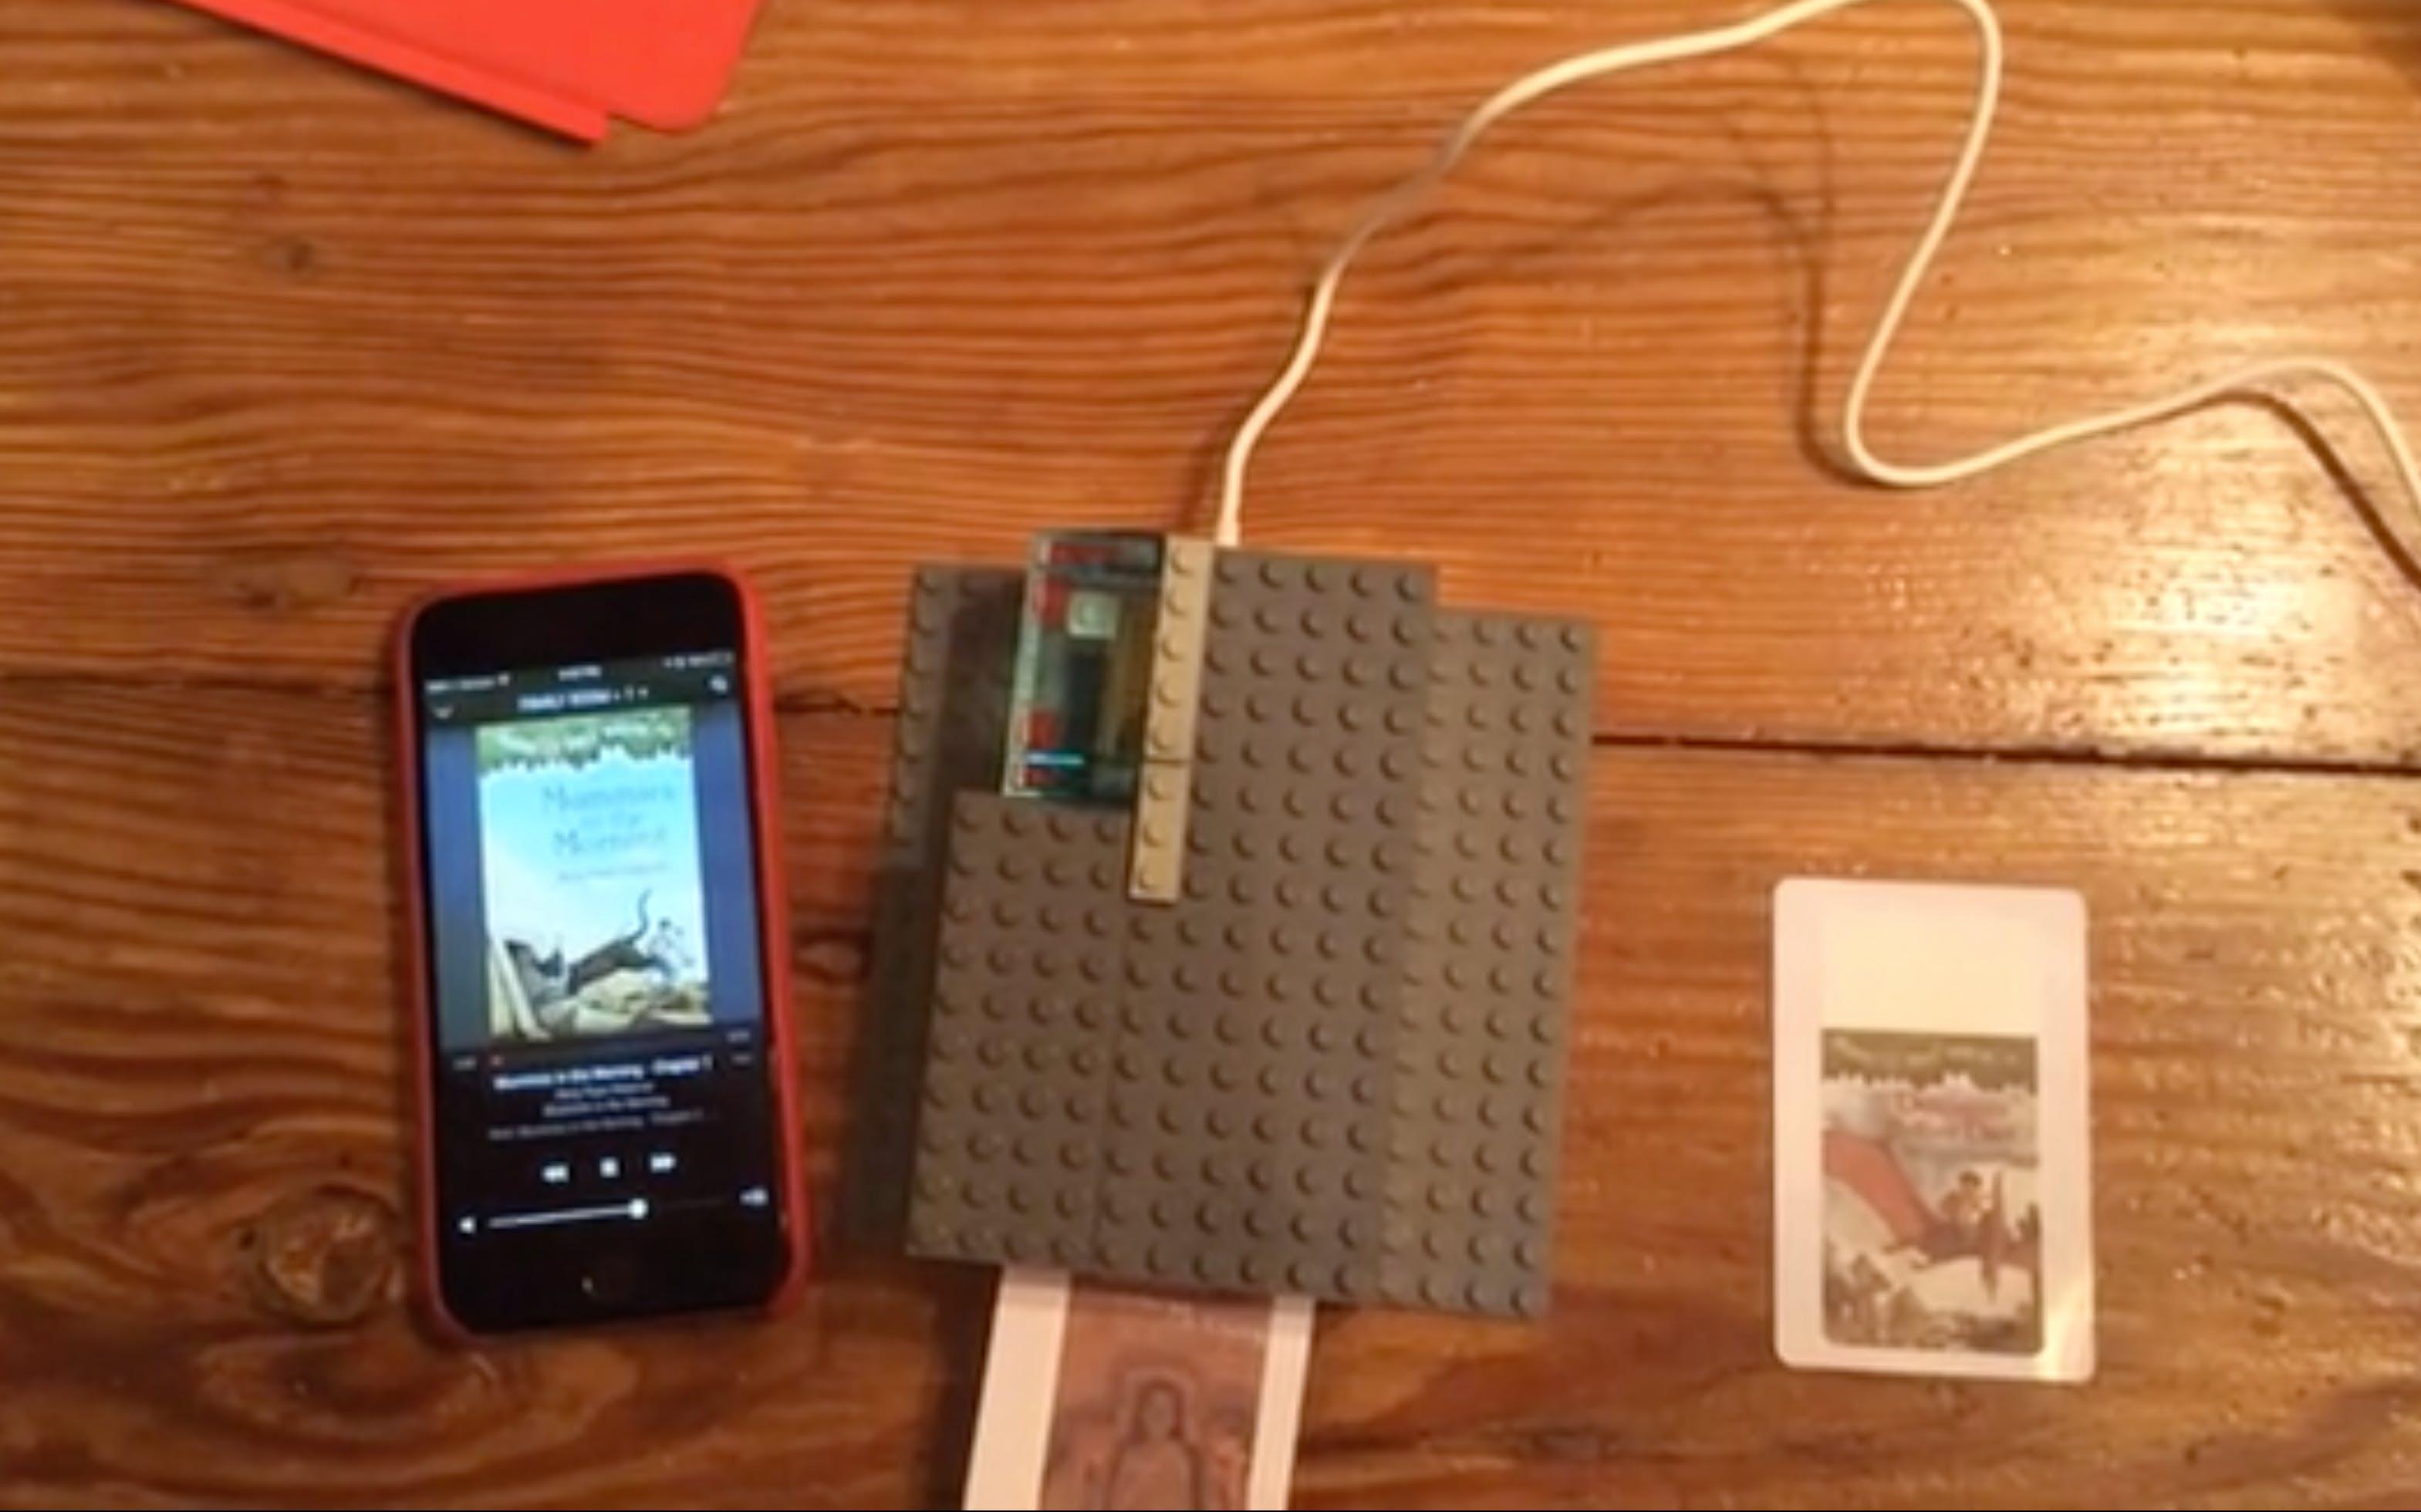 An RFID card based jukebox, using Sonos